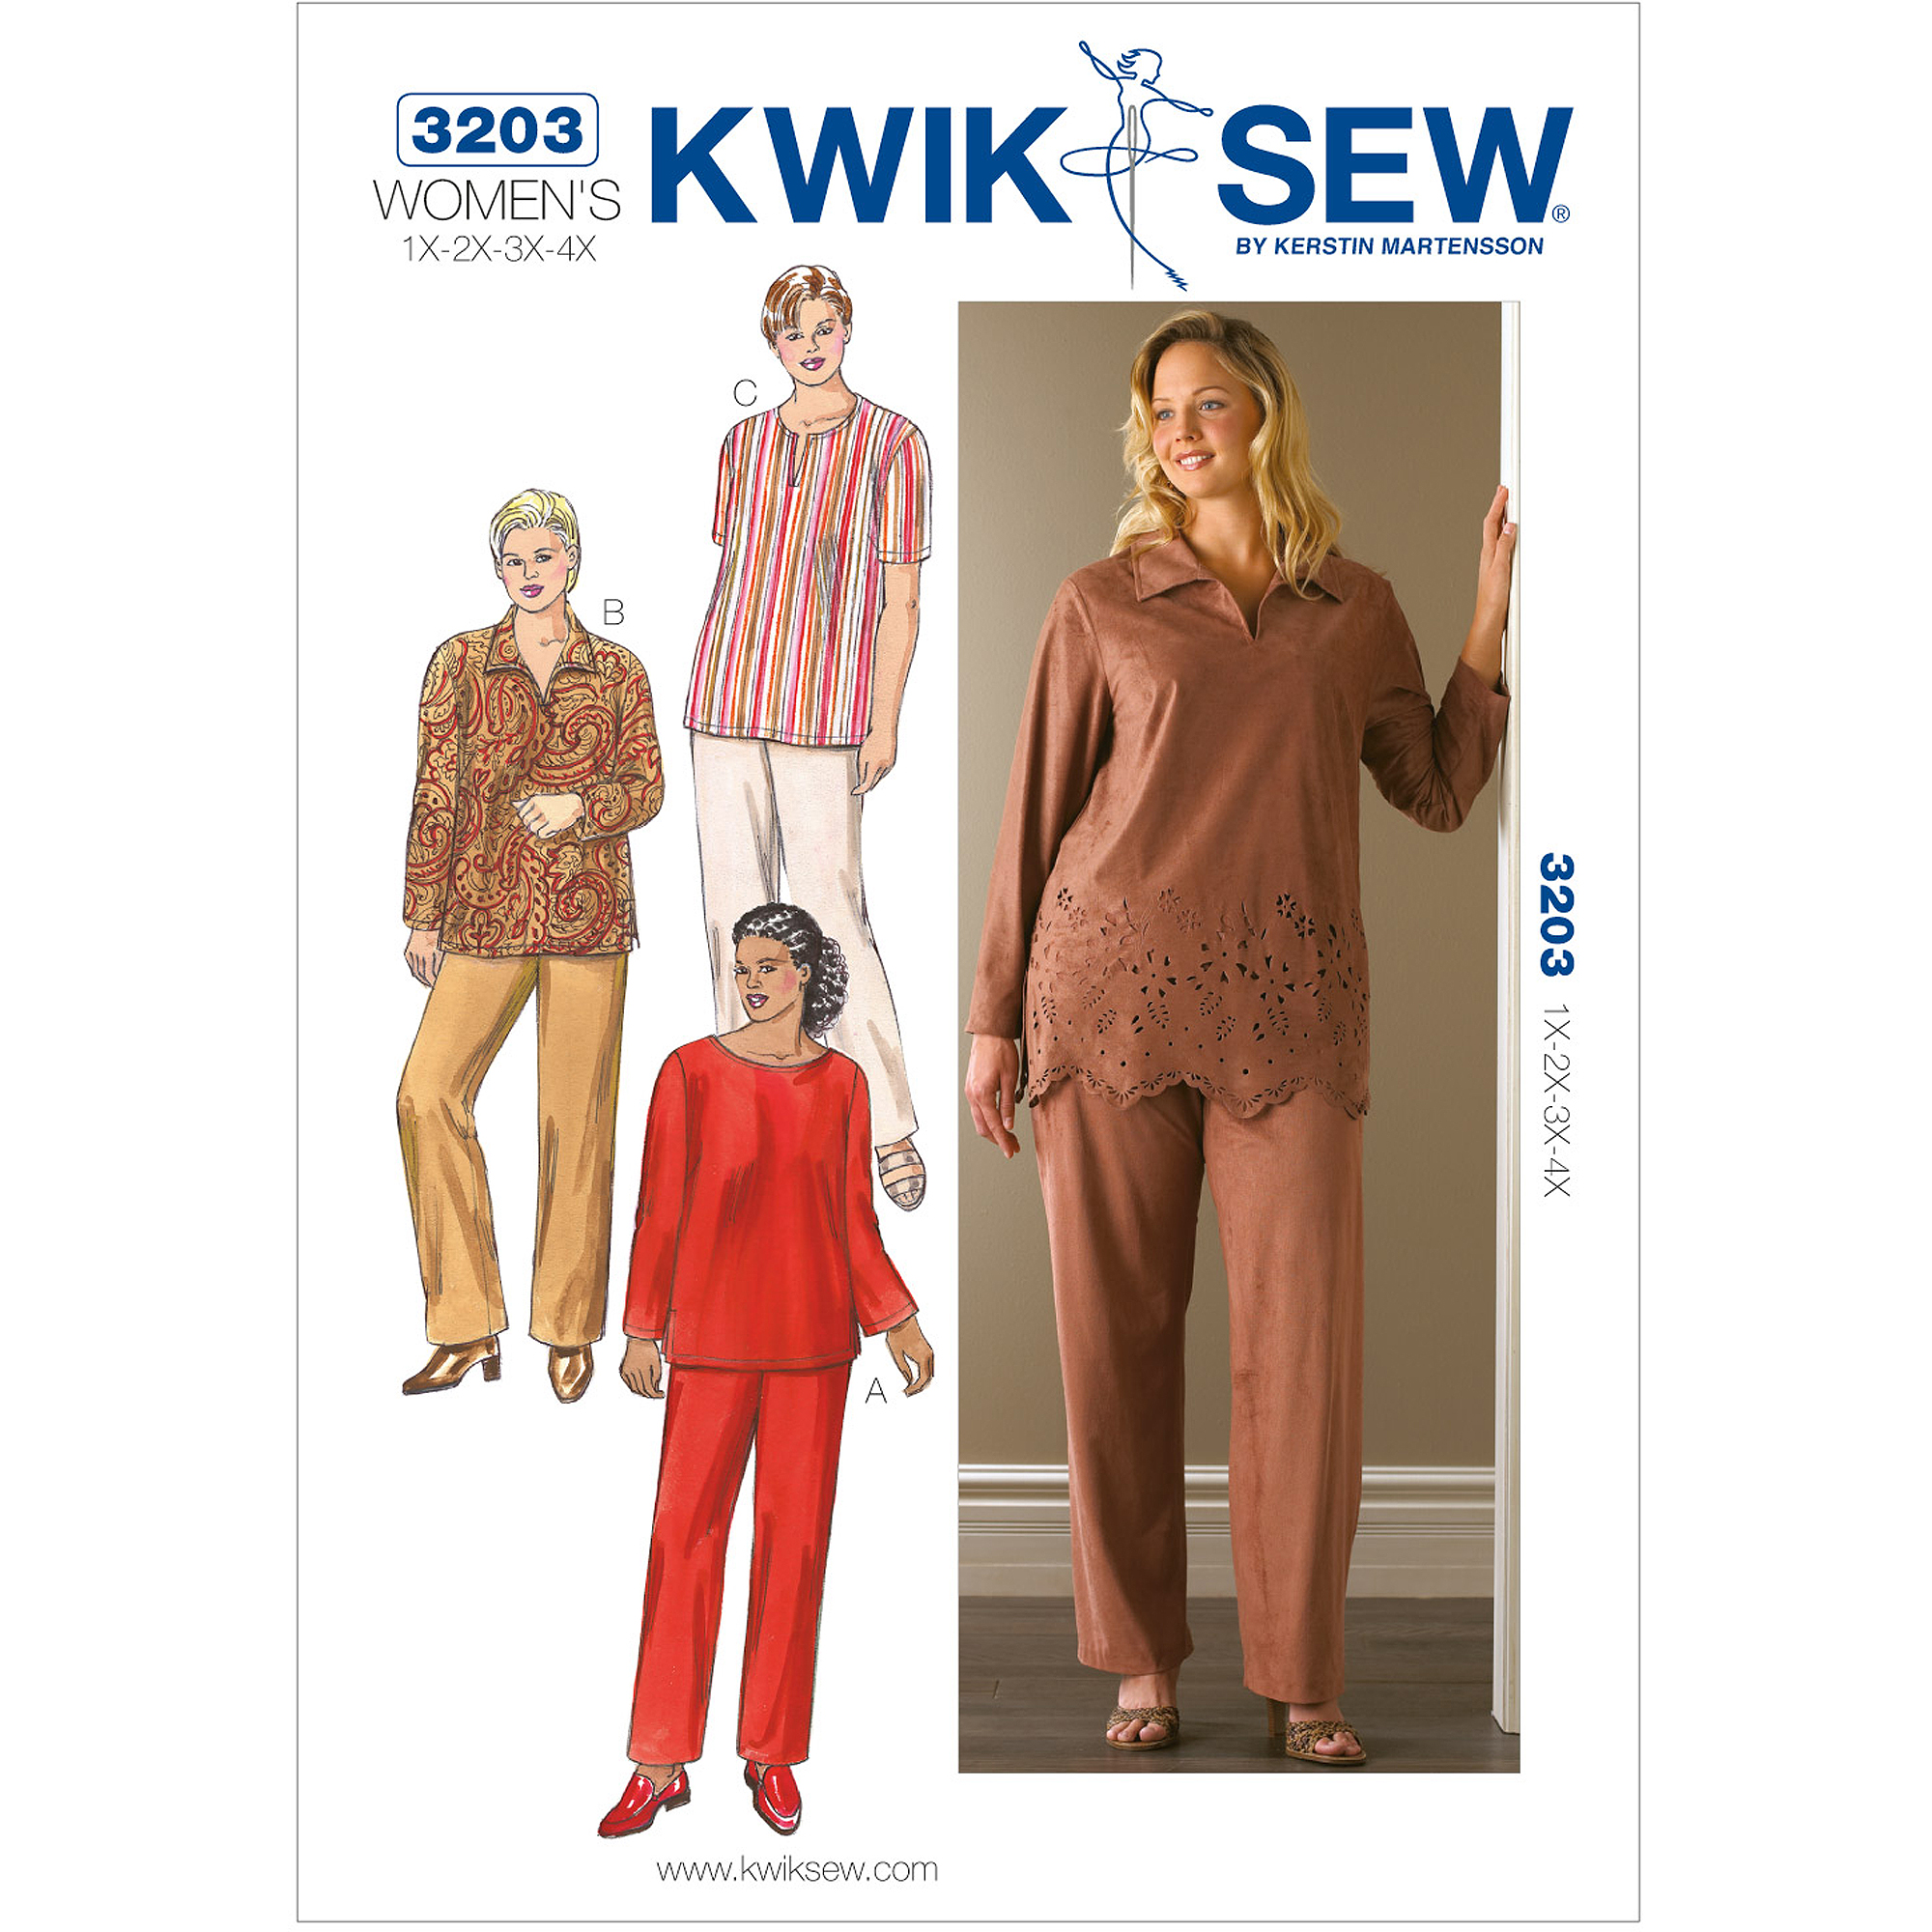 Kwik Sew Pattern Tunics and Pants, (1X, 2X, 3X, 4X)